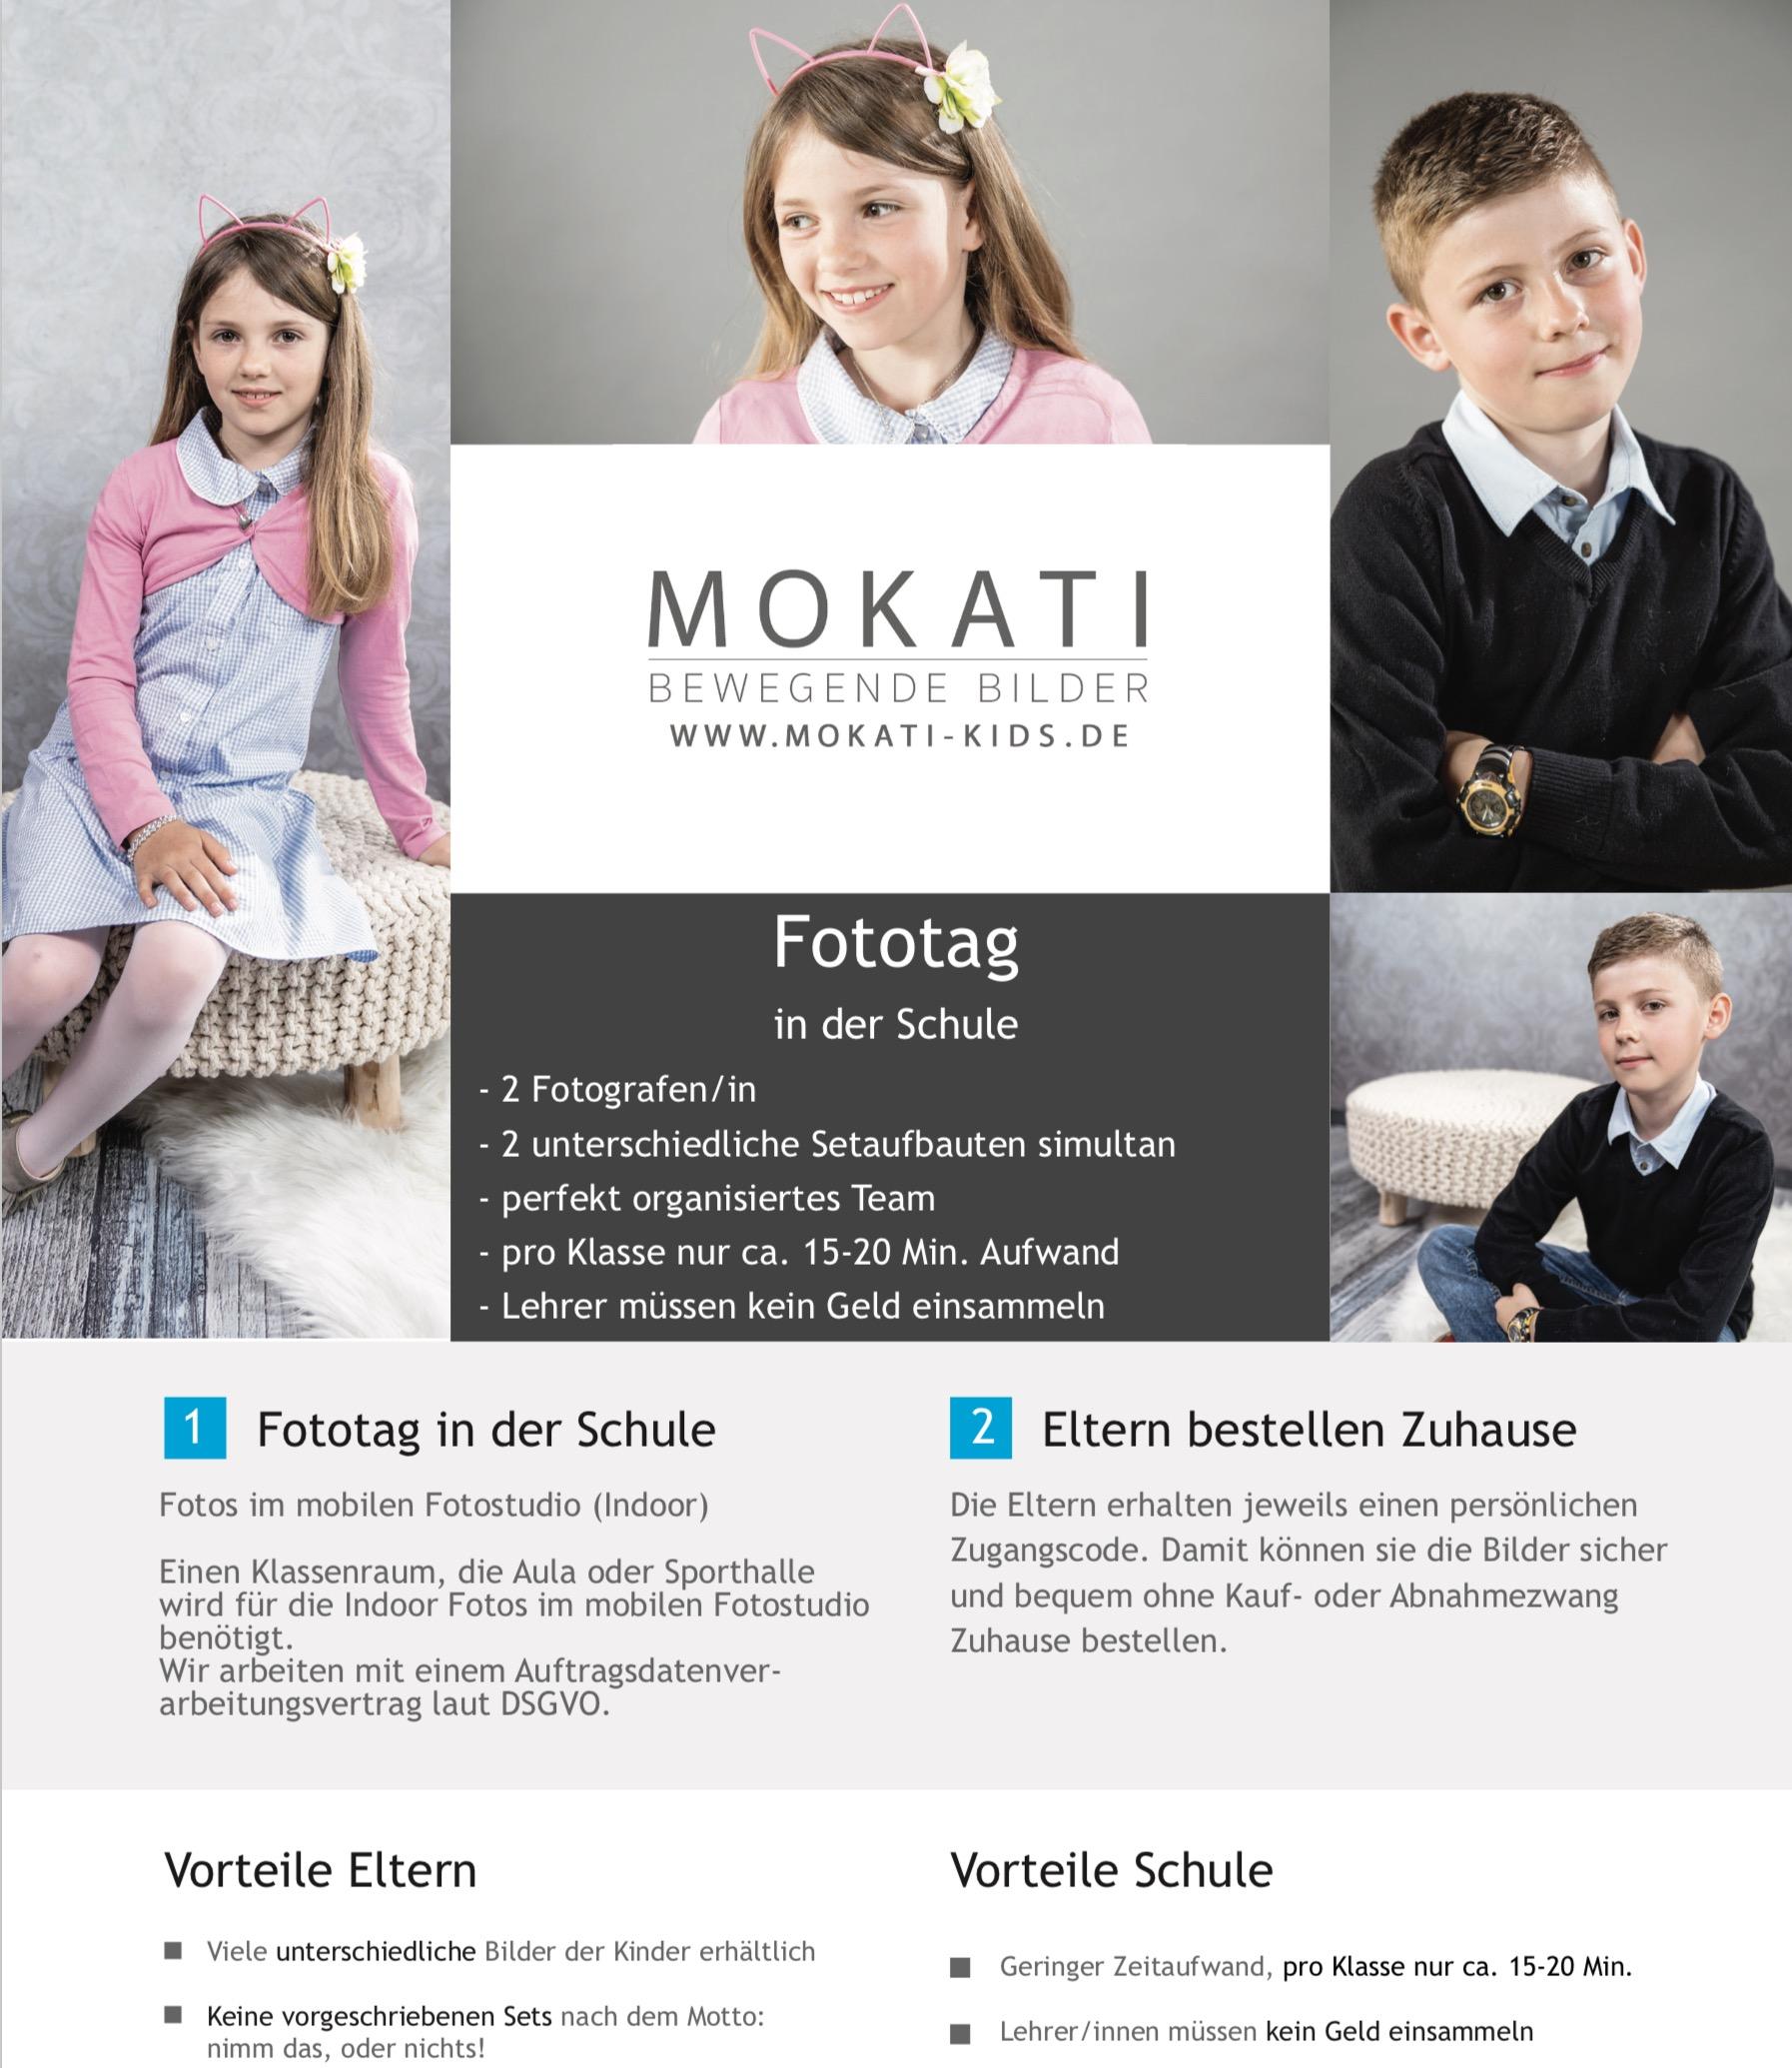 Fotograf in der Schule - Portraitfotos, Klassenfoto